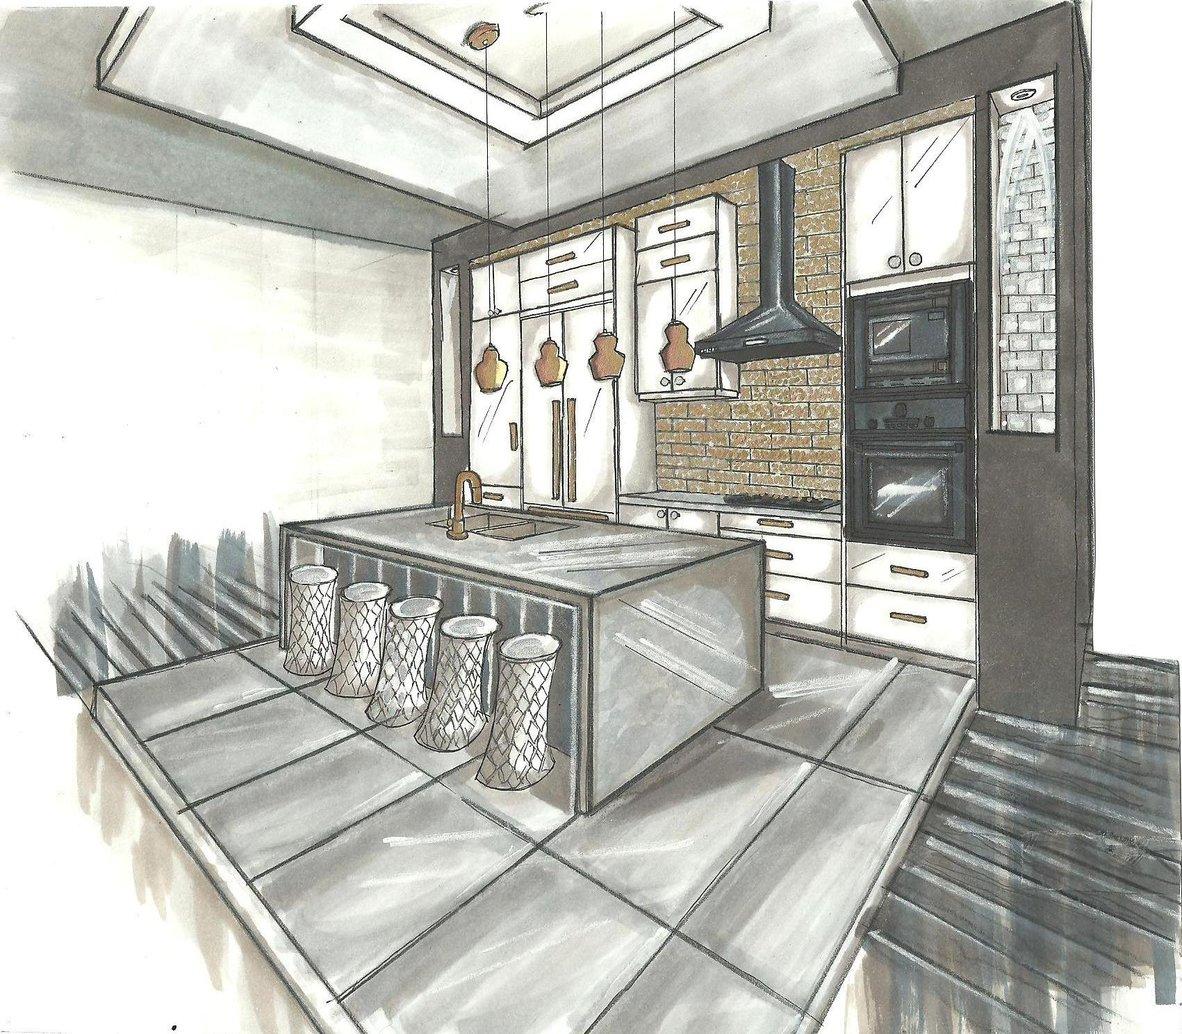 perfect cuisine dessiner une cuisine en perspective ultrabook de portfolio esquisses with dessin. Black Bedroom Furniture Sets. Home Design Ideas